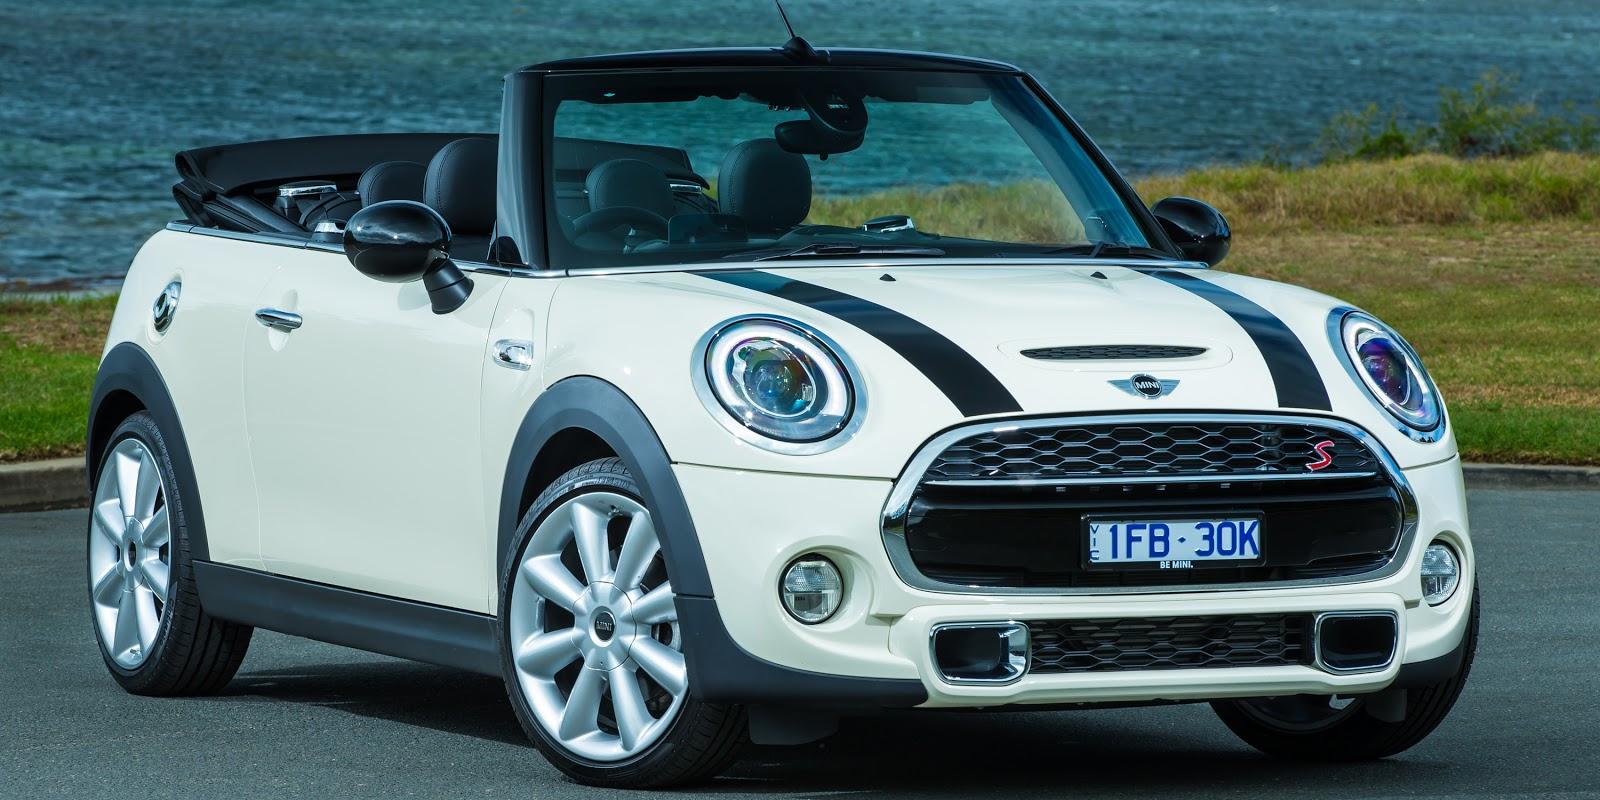 Đánh giá xe Mini Cooper Convertible 2016